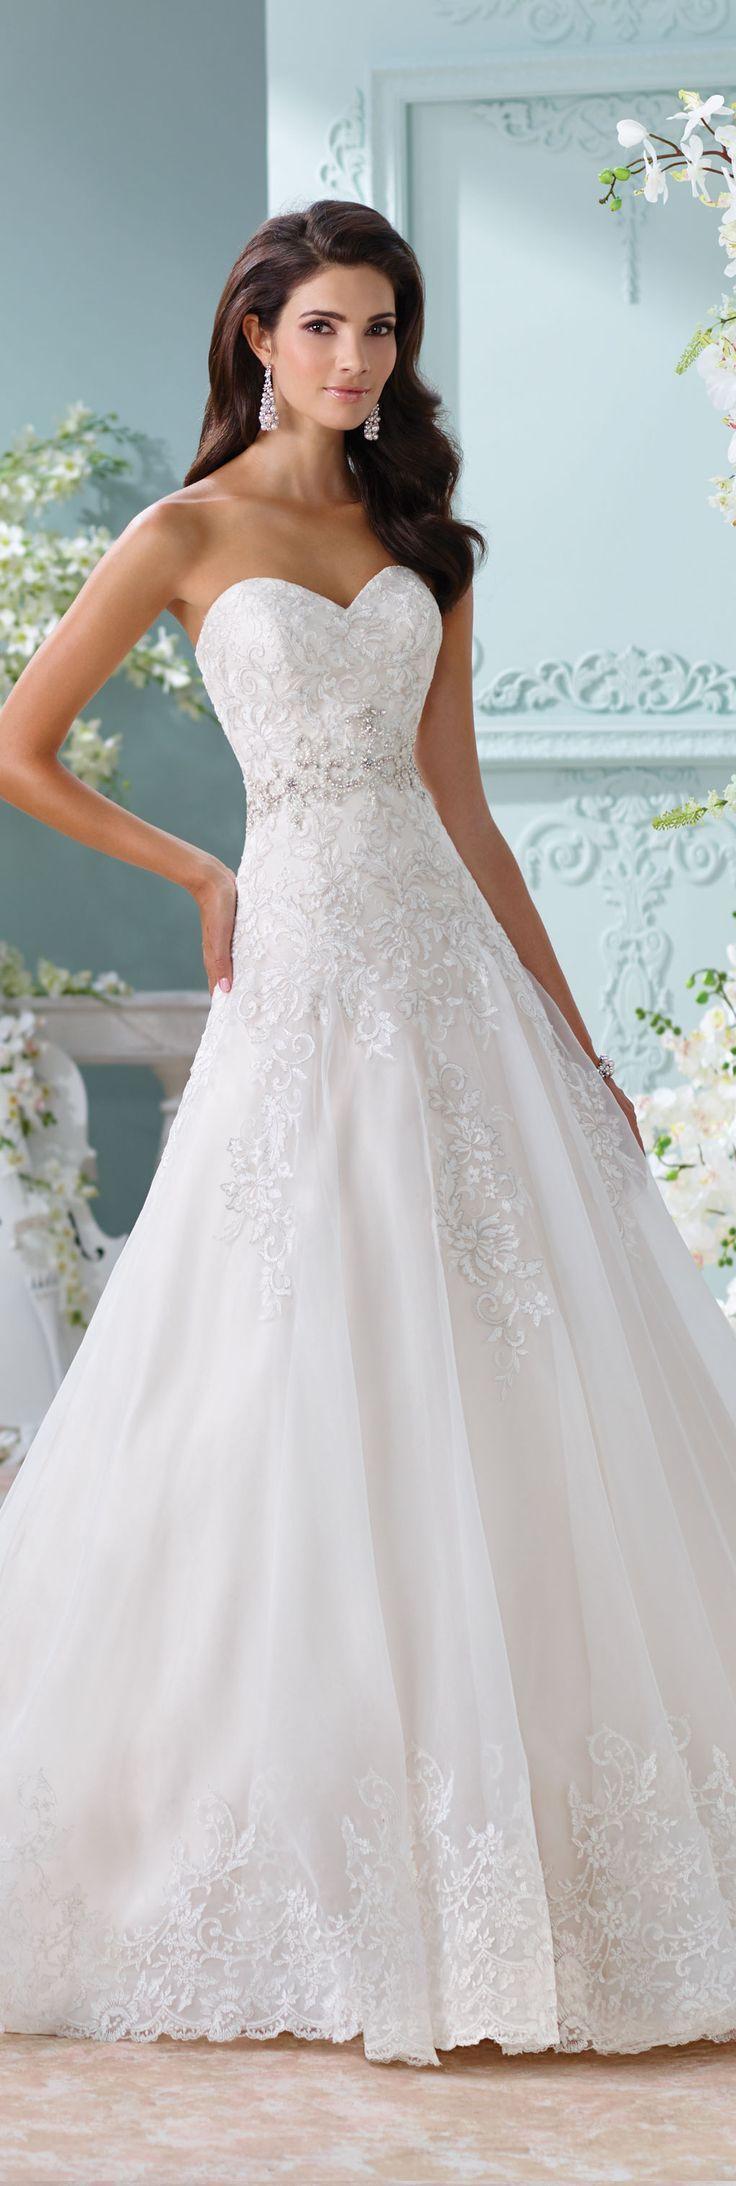 The david tutera for mon cheri spring wedding gown collection